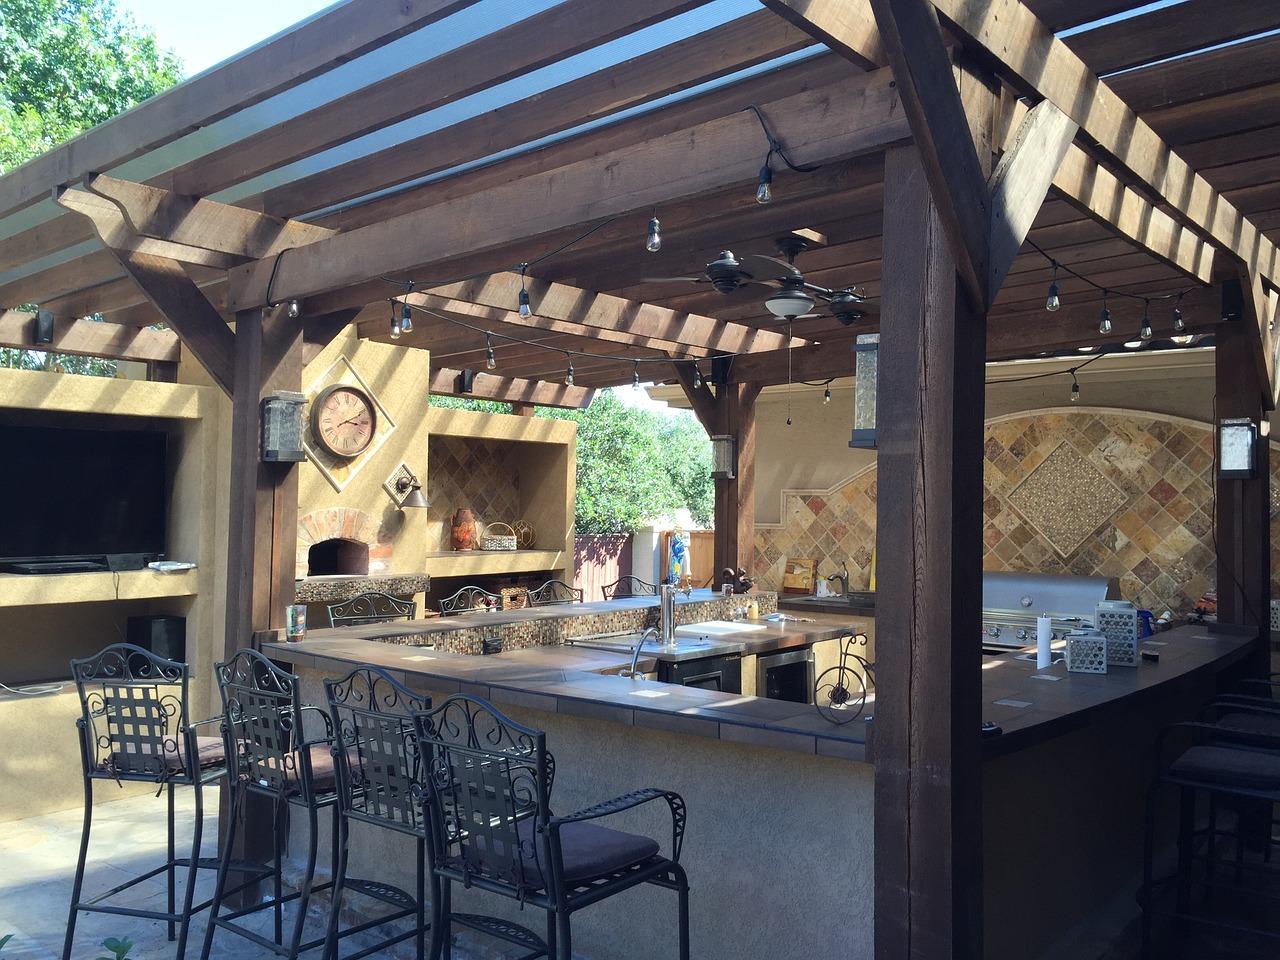 patio-cover-1748371_1280.jpg